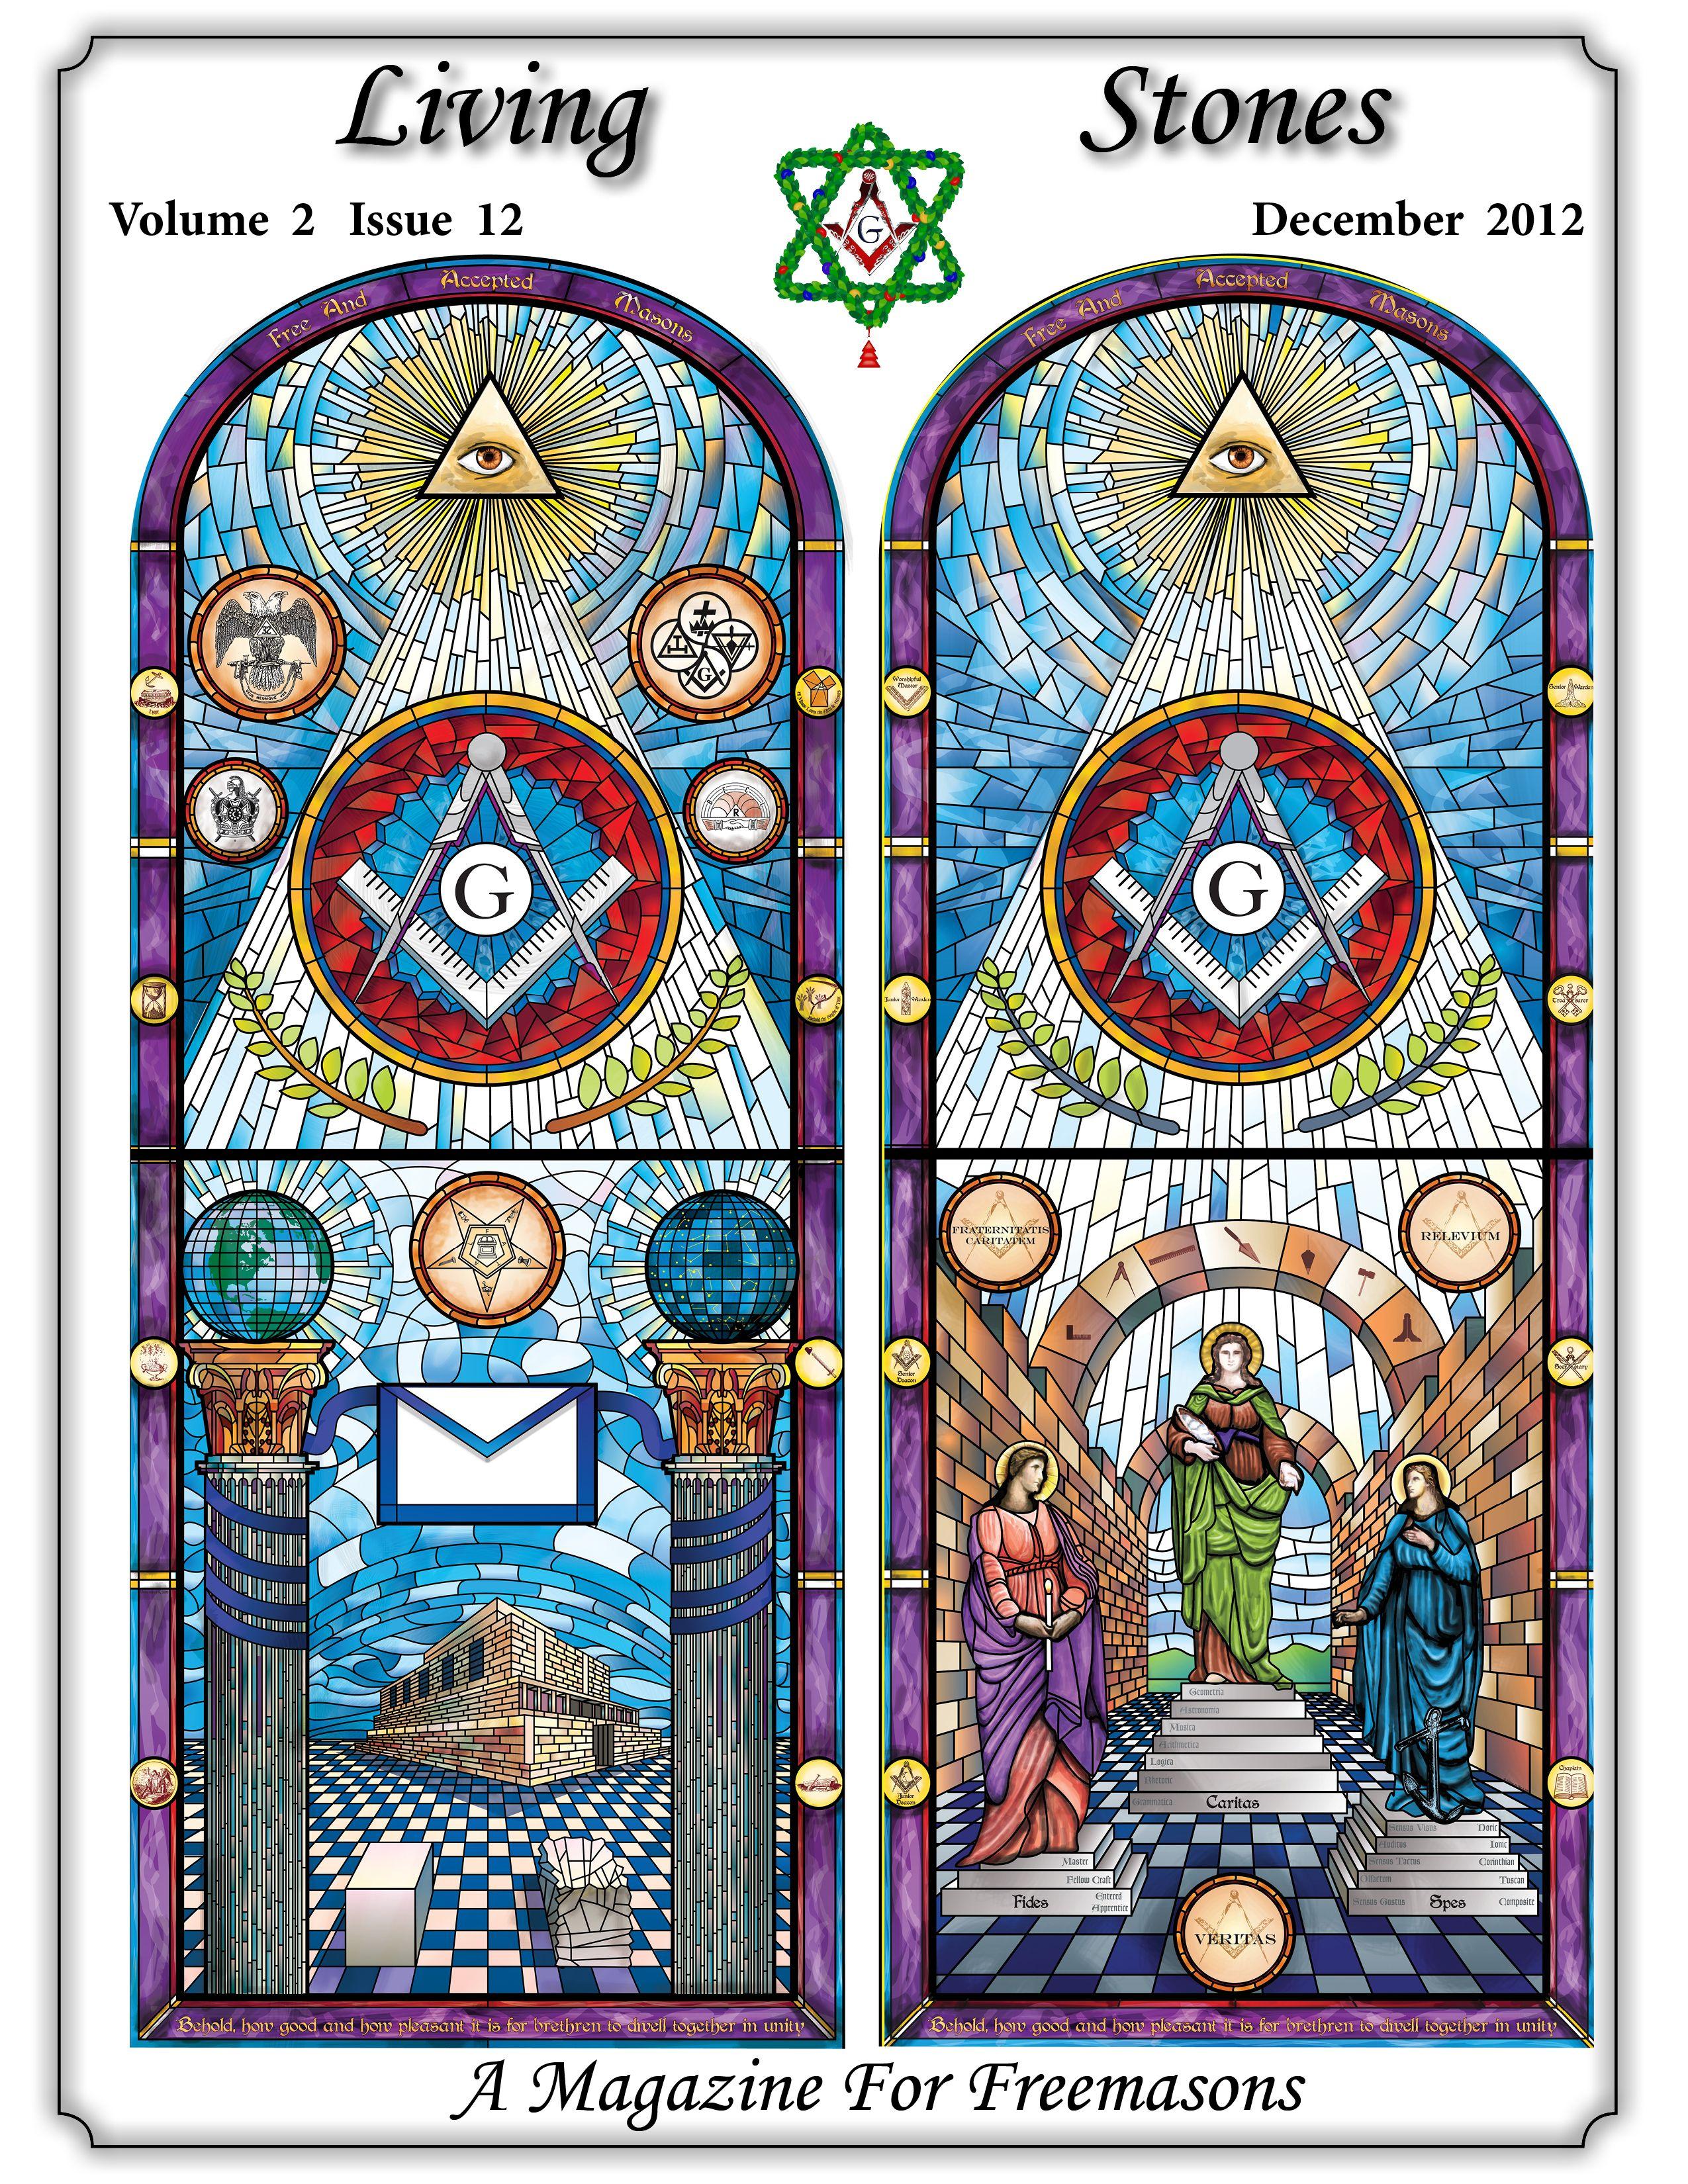 december 2012 issue freemasonry masonic magazine masonry masonic